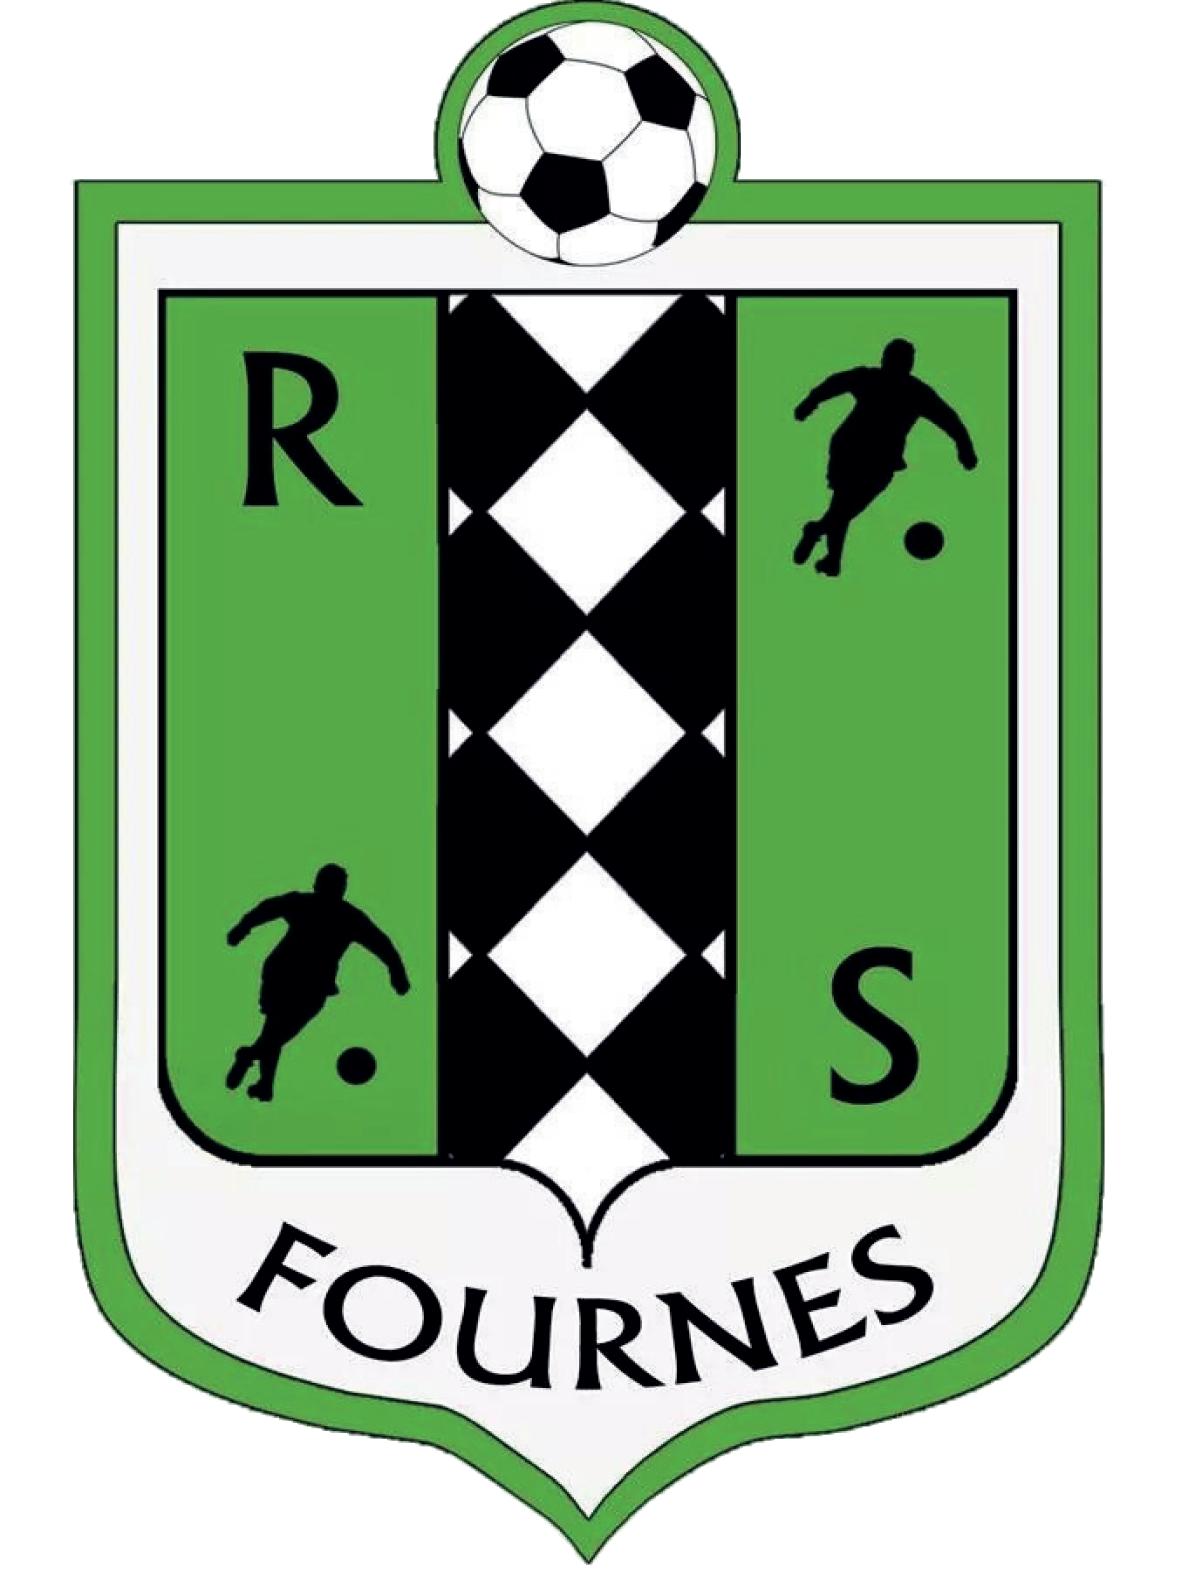 Fournes Football